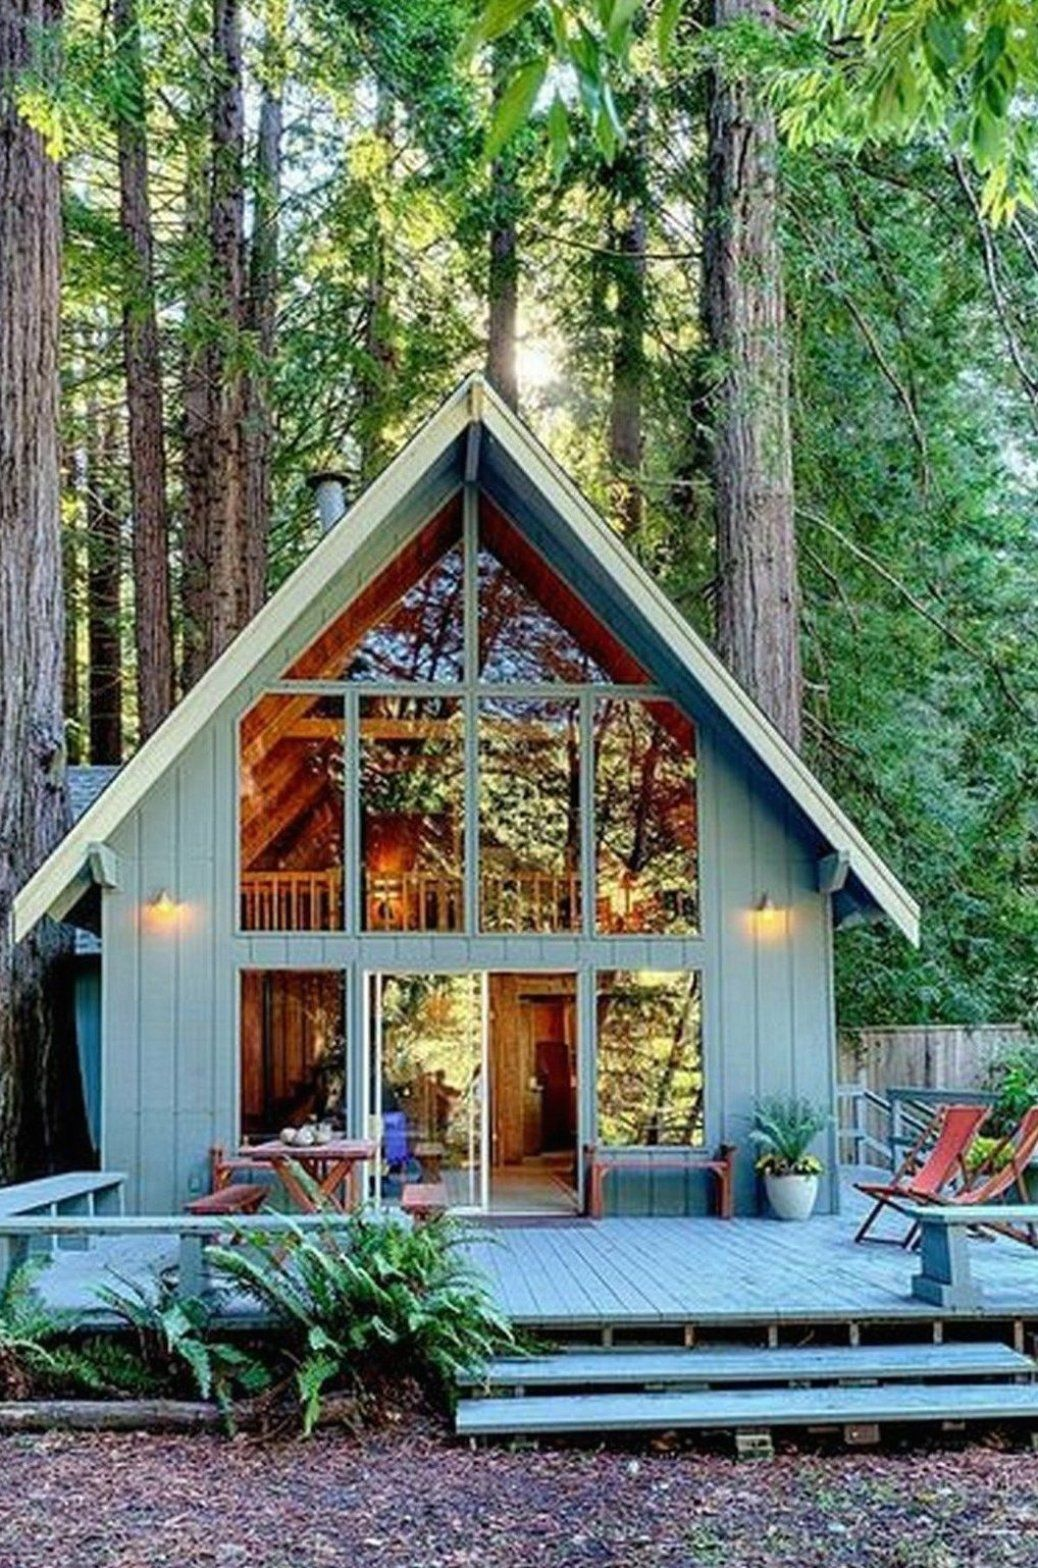 Homedecor Kitchendecor Walldecor In 2020 Best Tiny House Tiny House Movement Tiny House Rentals